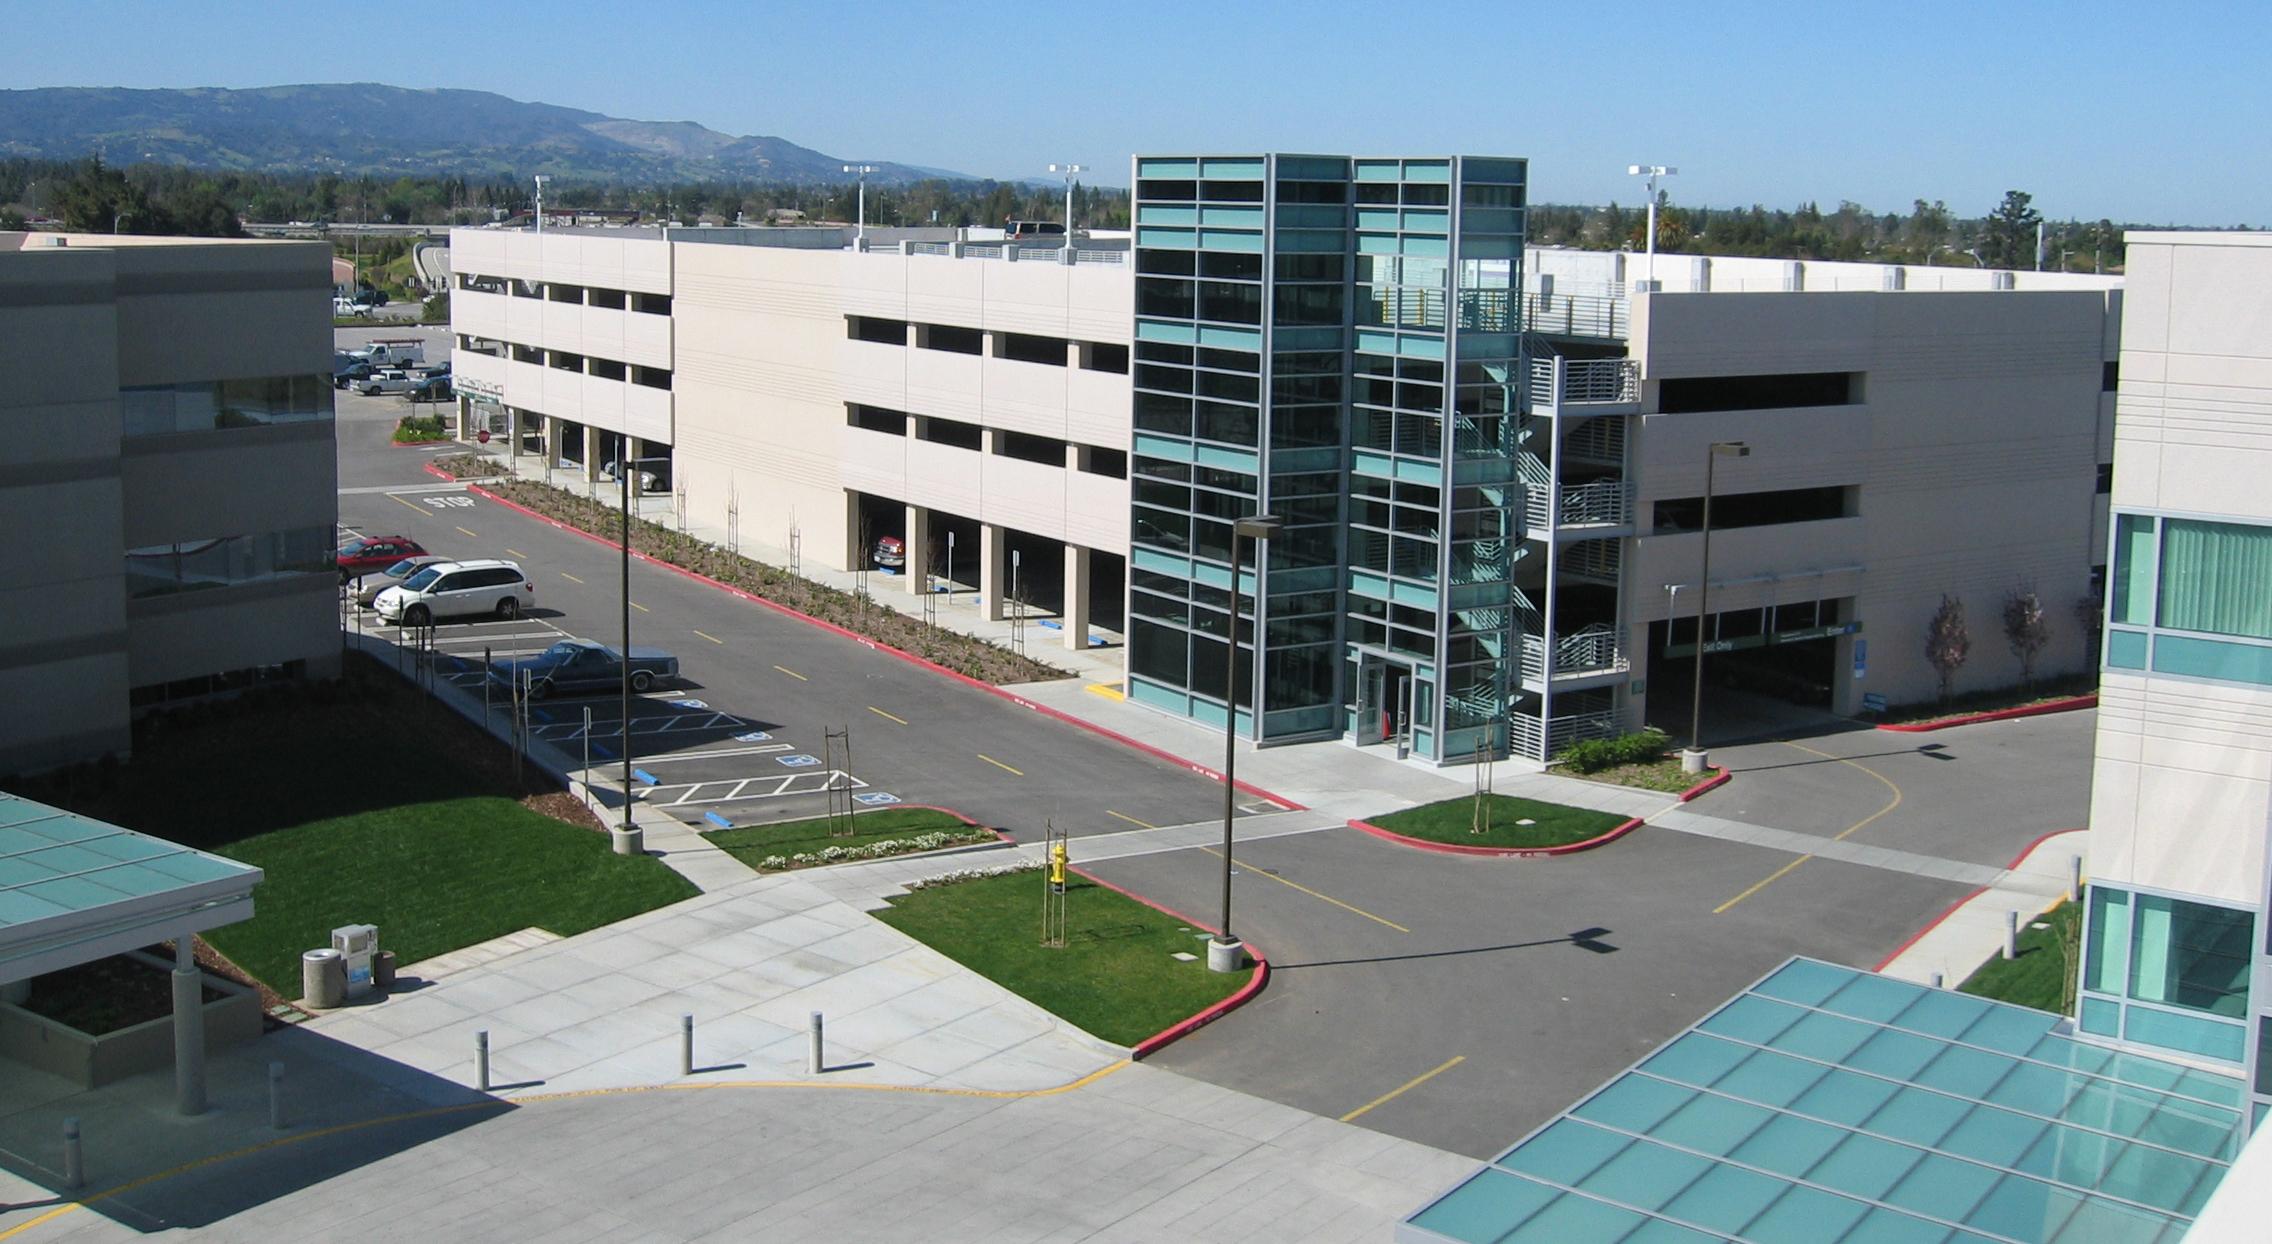 Samaritan Medical Center Parking Structure